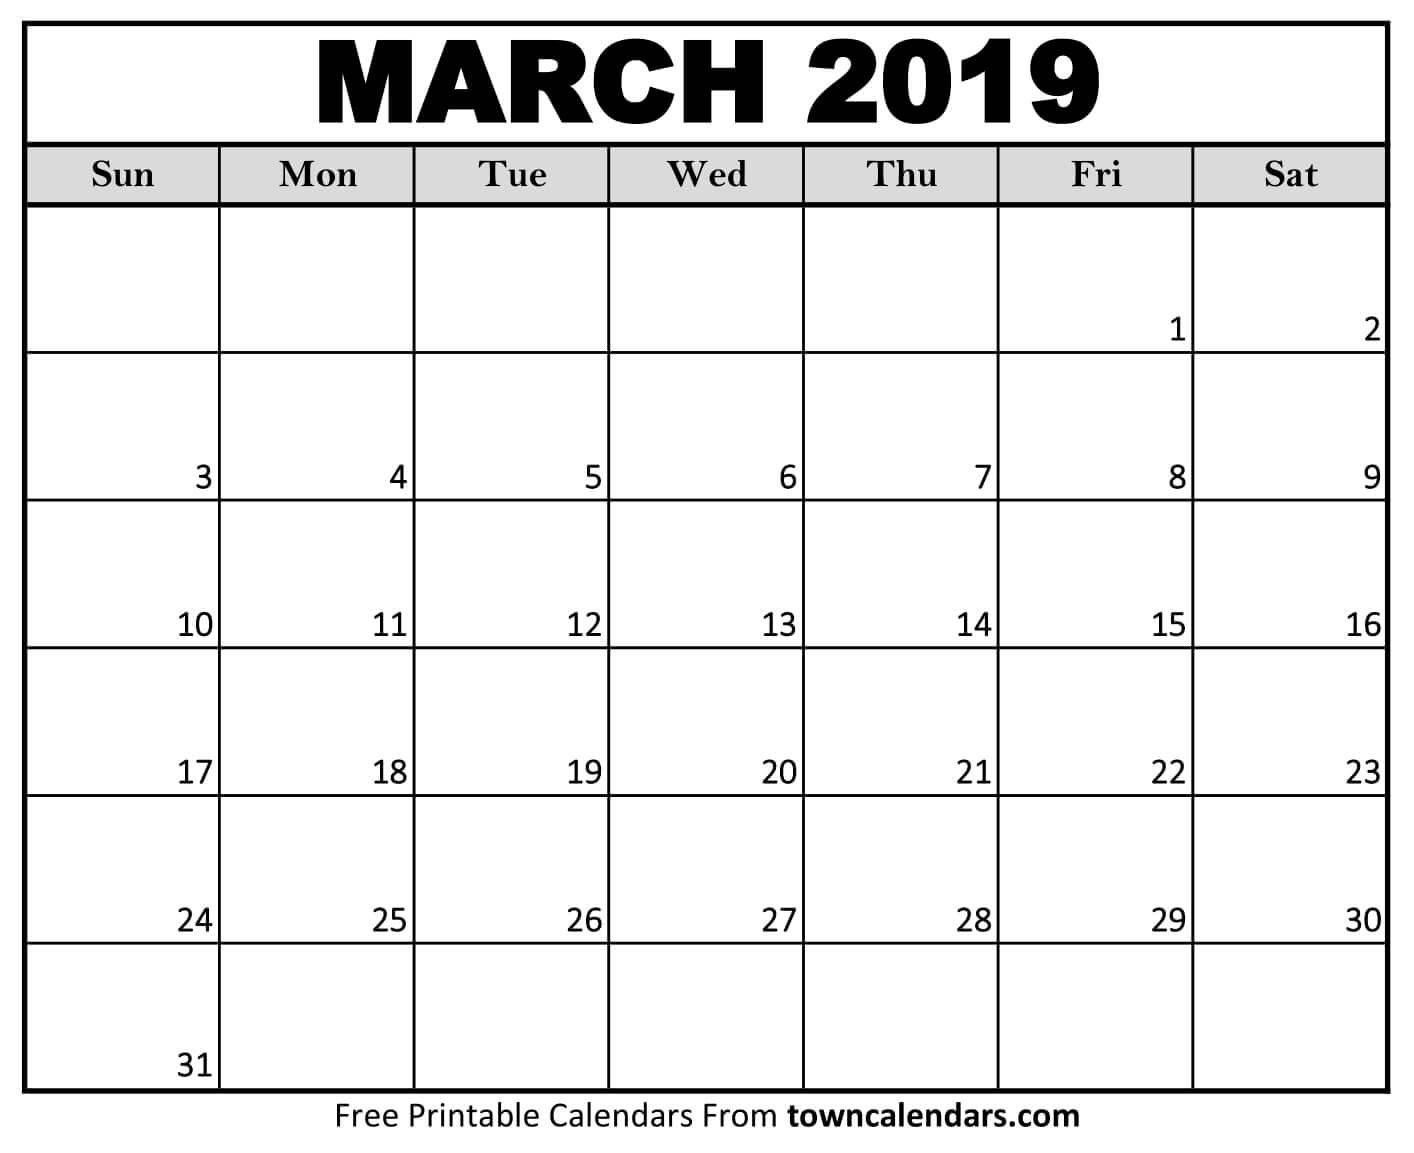 Printable March 2019 Calendar – Towncalendars Calendar Of 2019 March